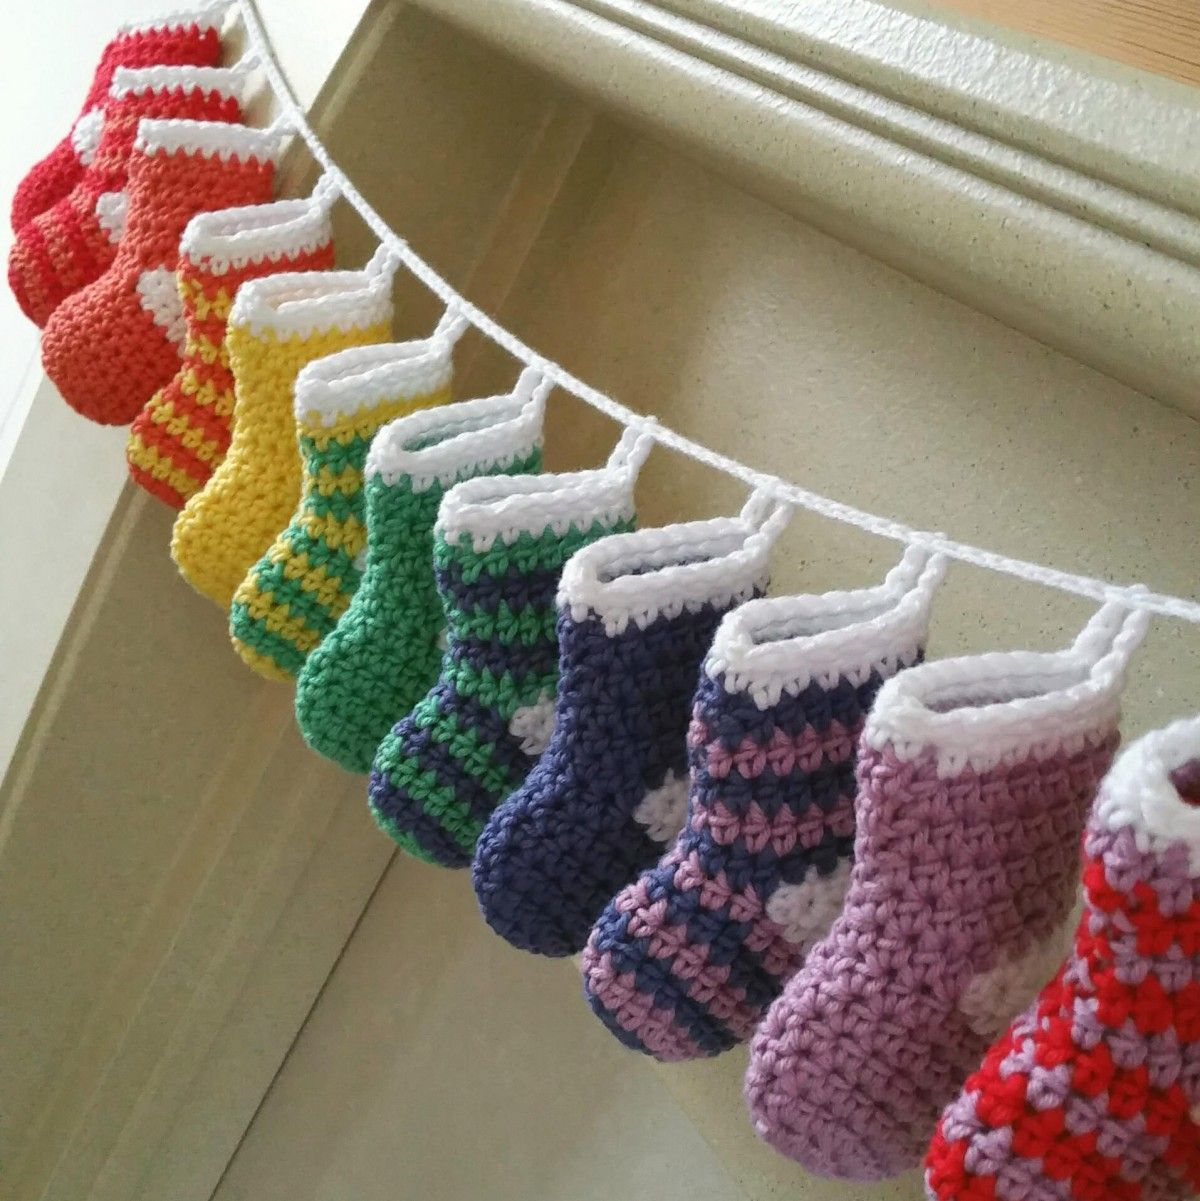 How to Crochet a Mini Stocking Advent | Crochet | Pinterest ...